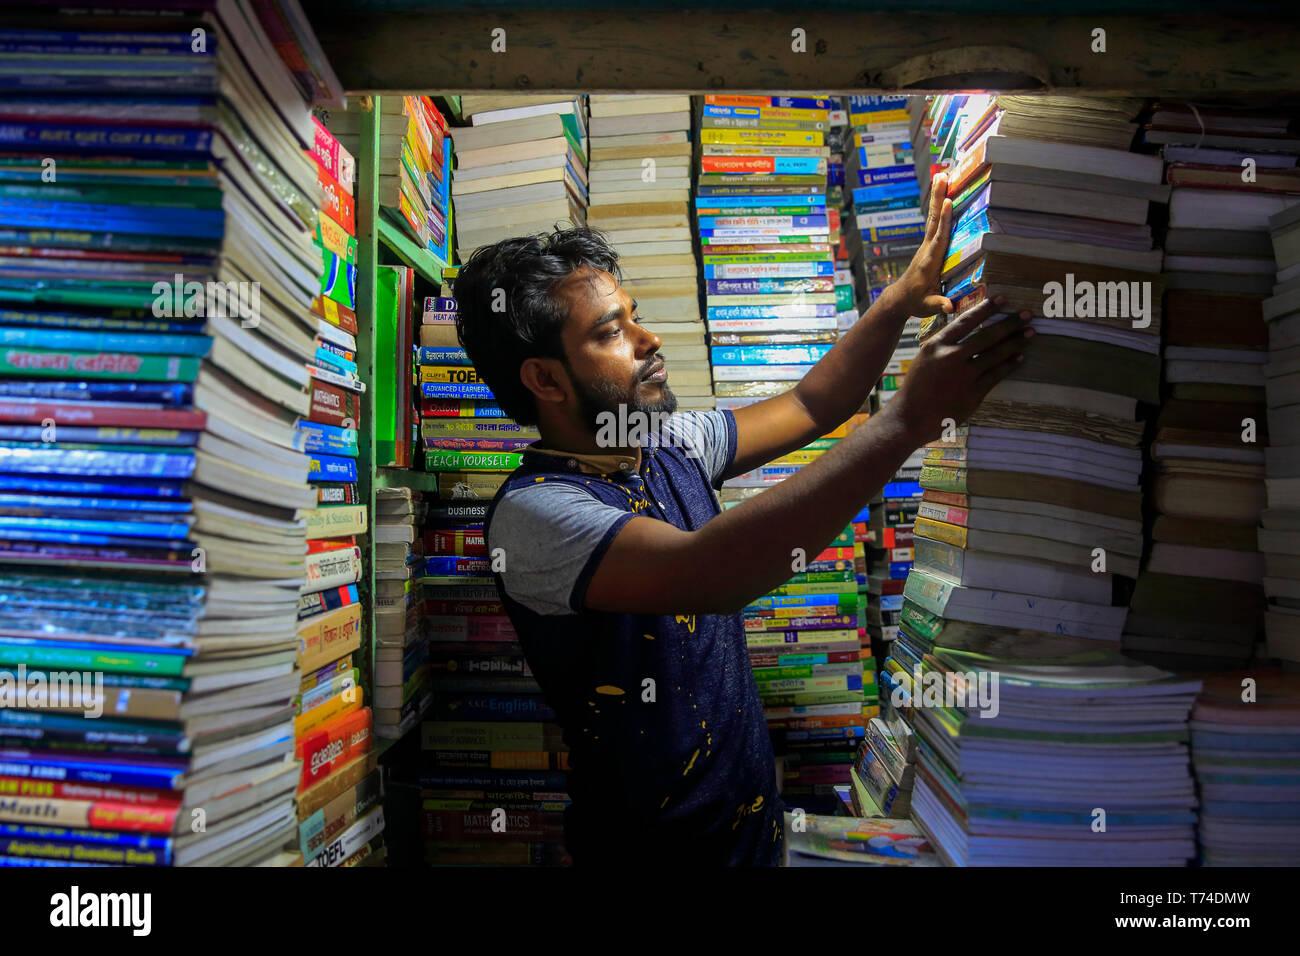 Secondhand bookstall at Nilkhet Book MArket. Dhaka, Bangladesh. - Stock Image